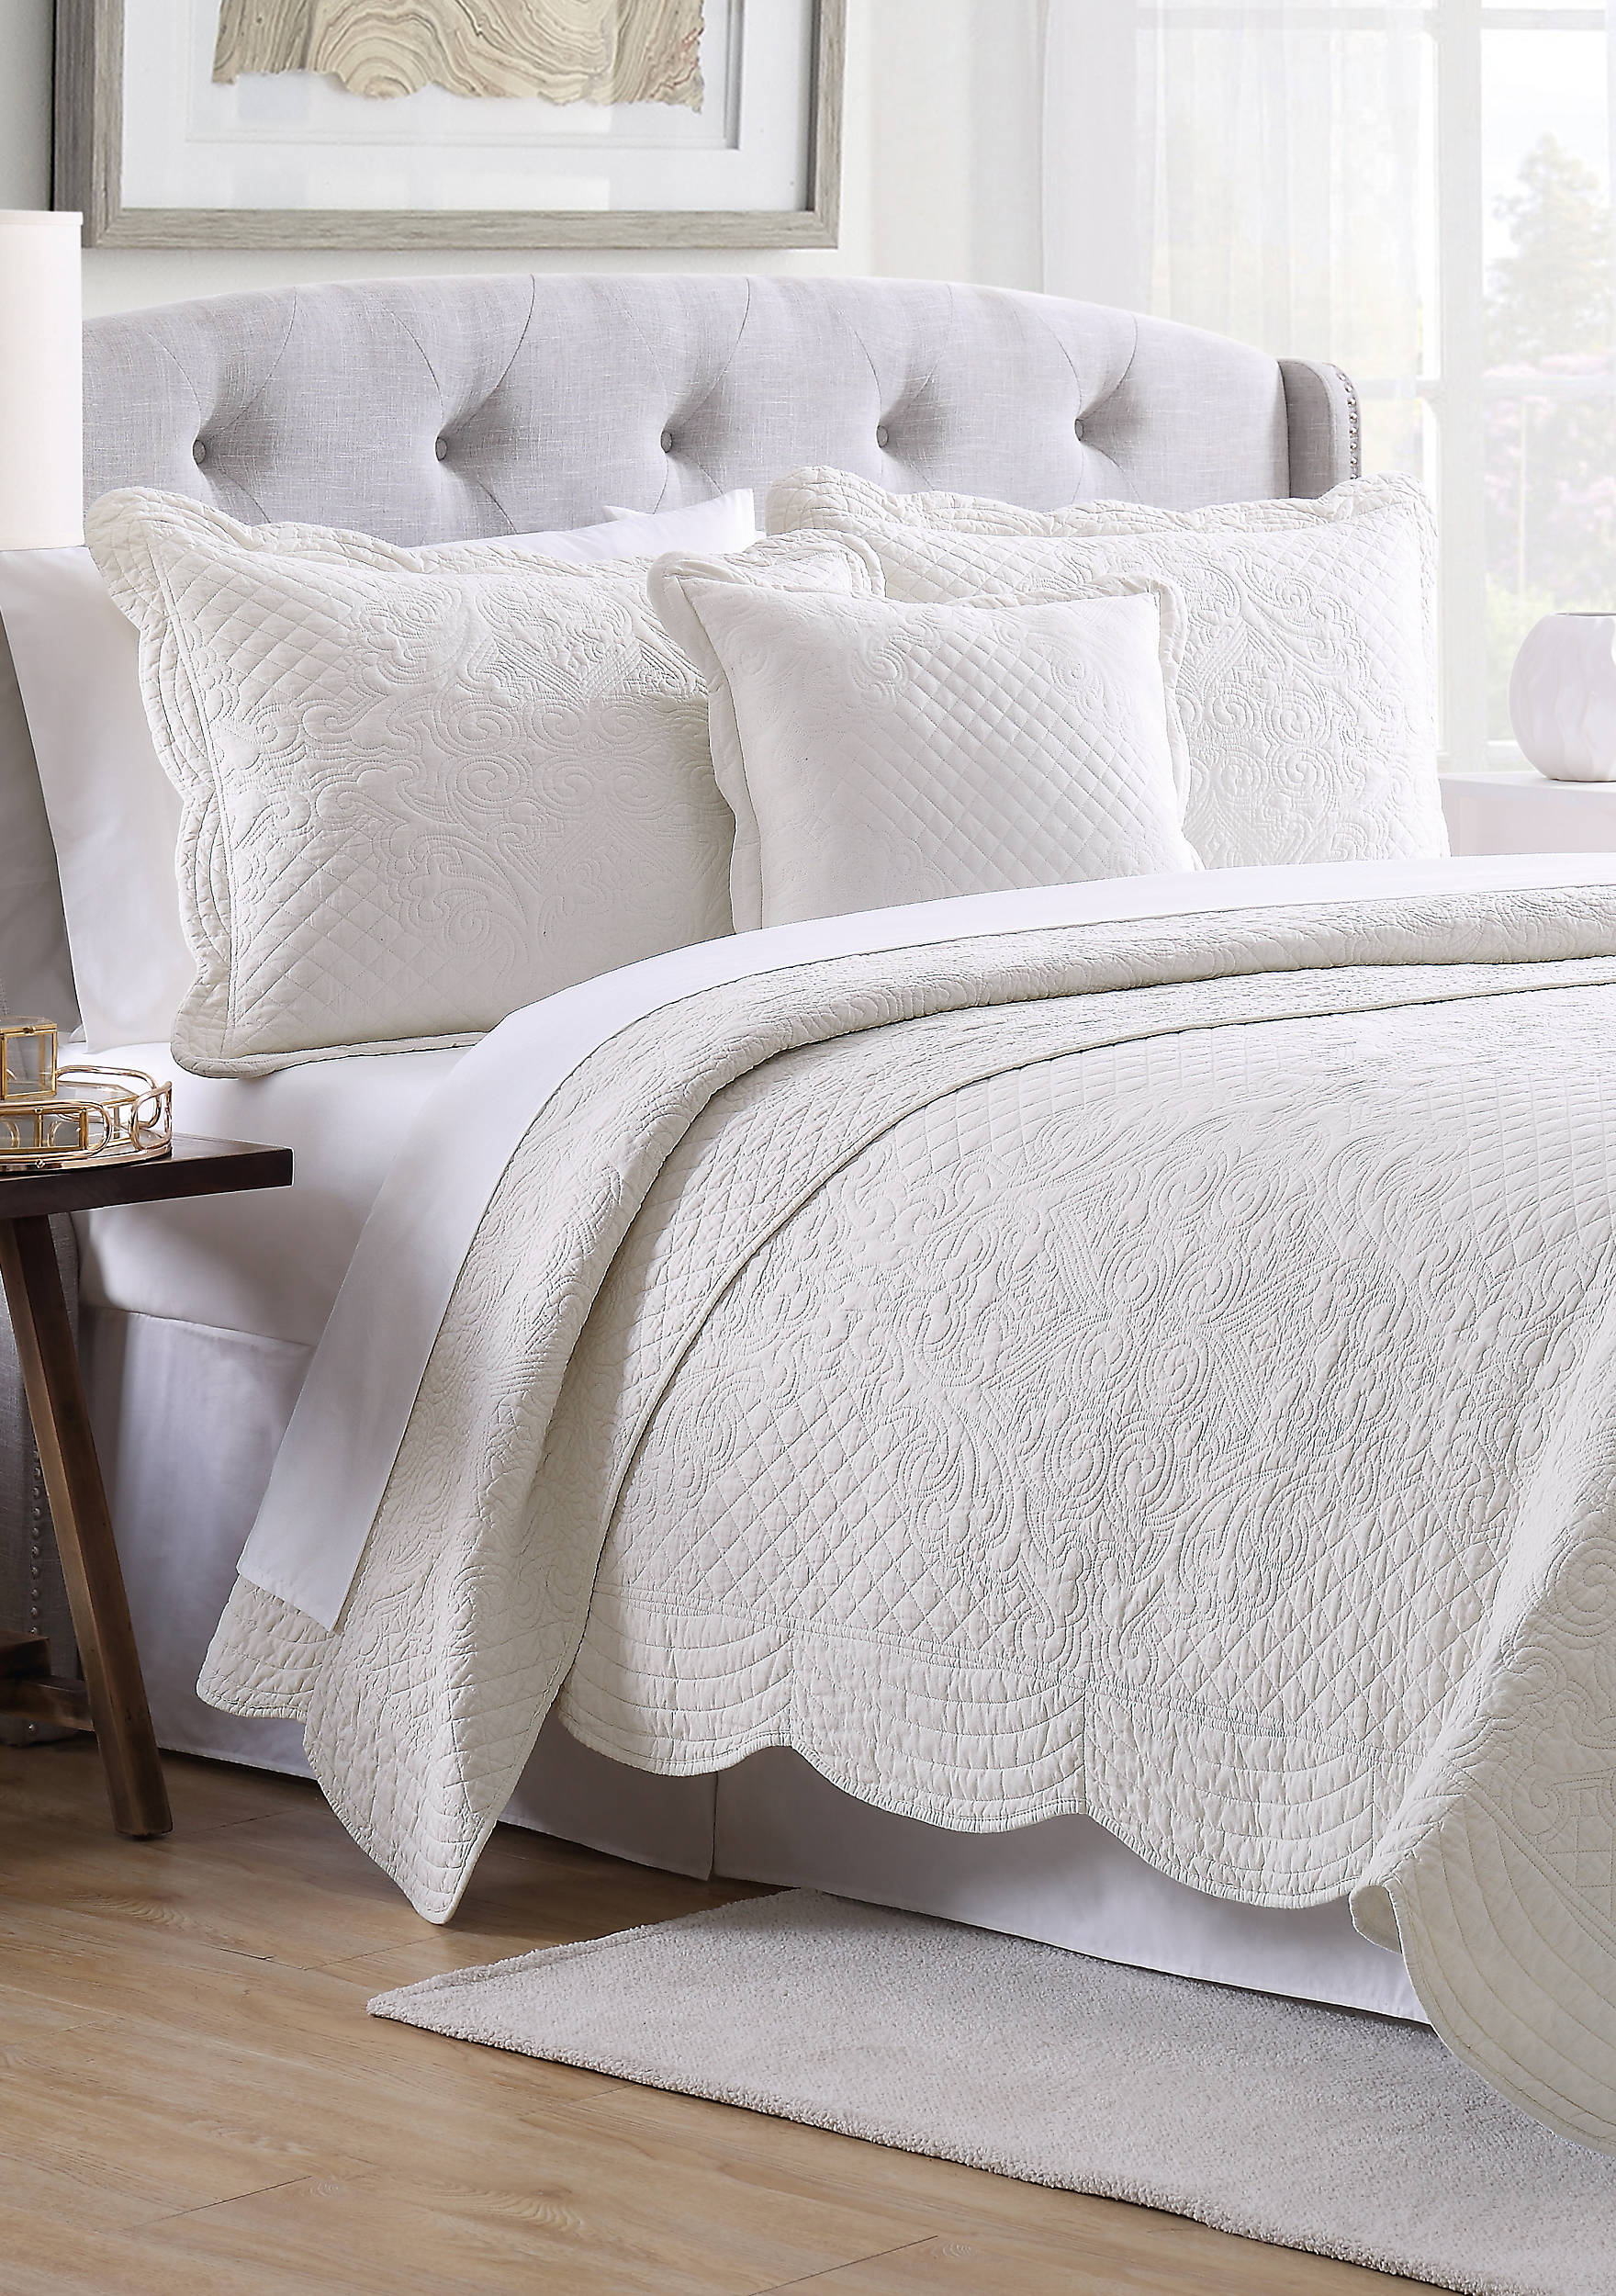 scalloped chenillescallopedcomfortersetbyperihome cfm cover scallop home by set hayneedle comforter peri chenille product master duvet